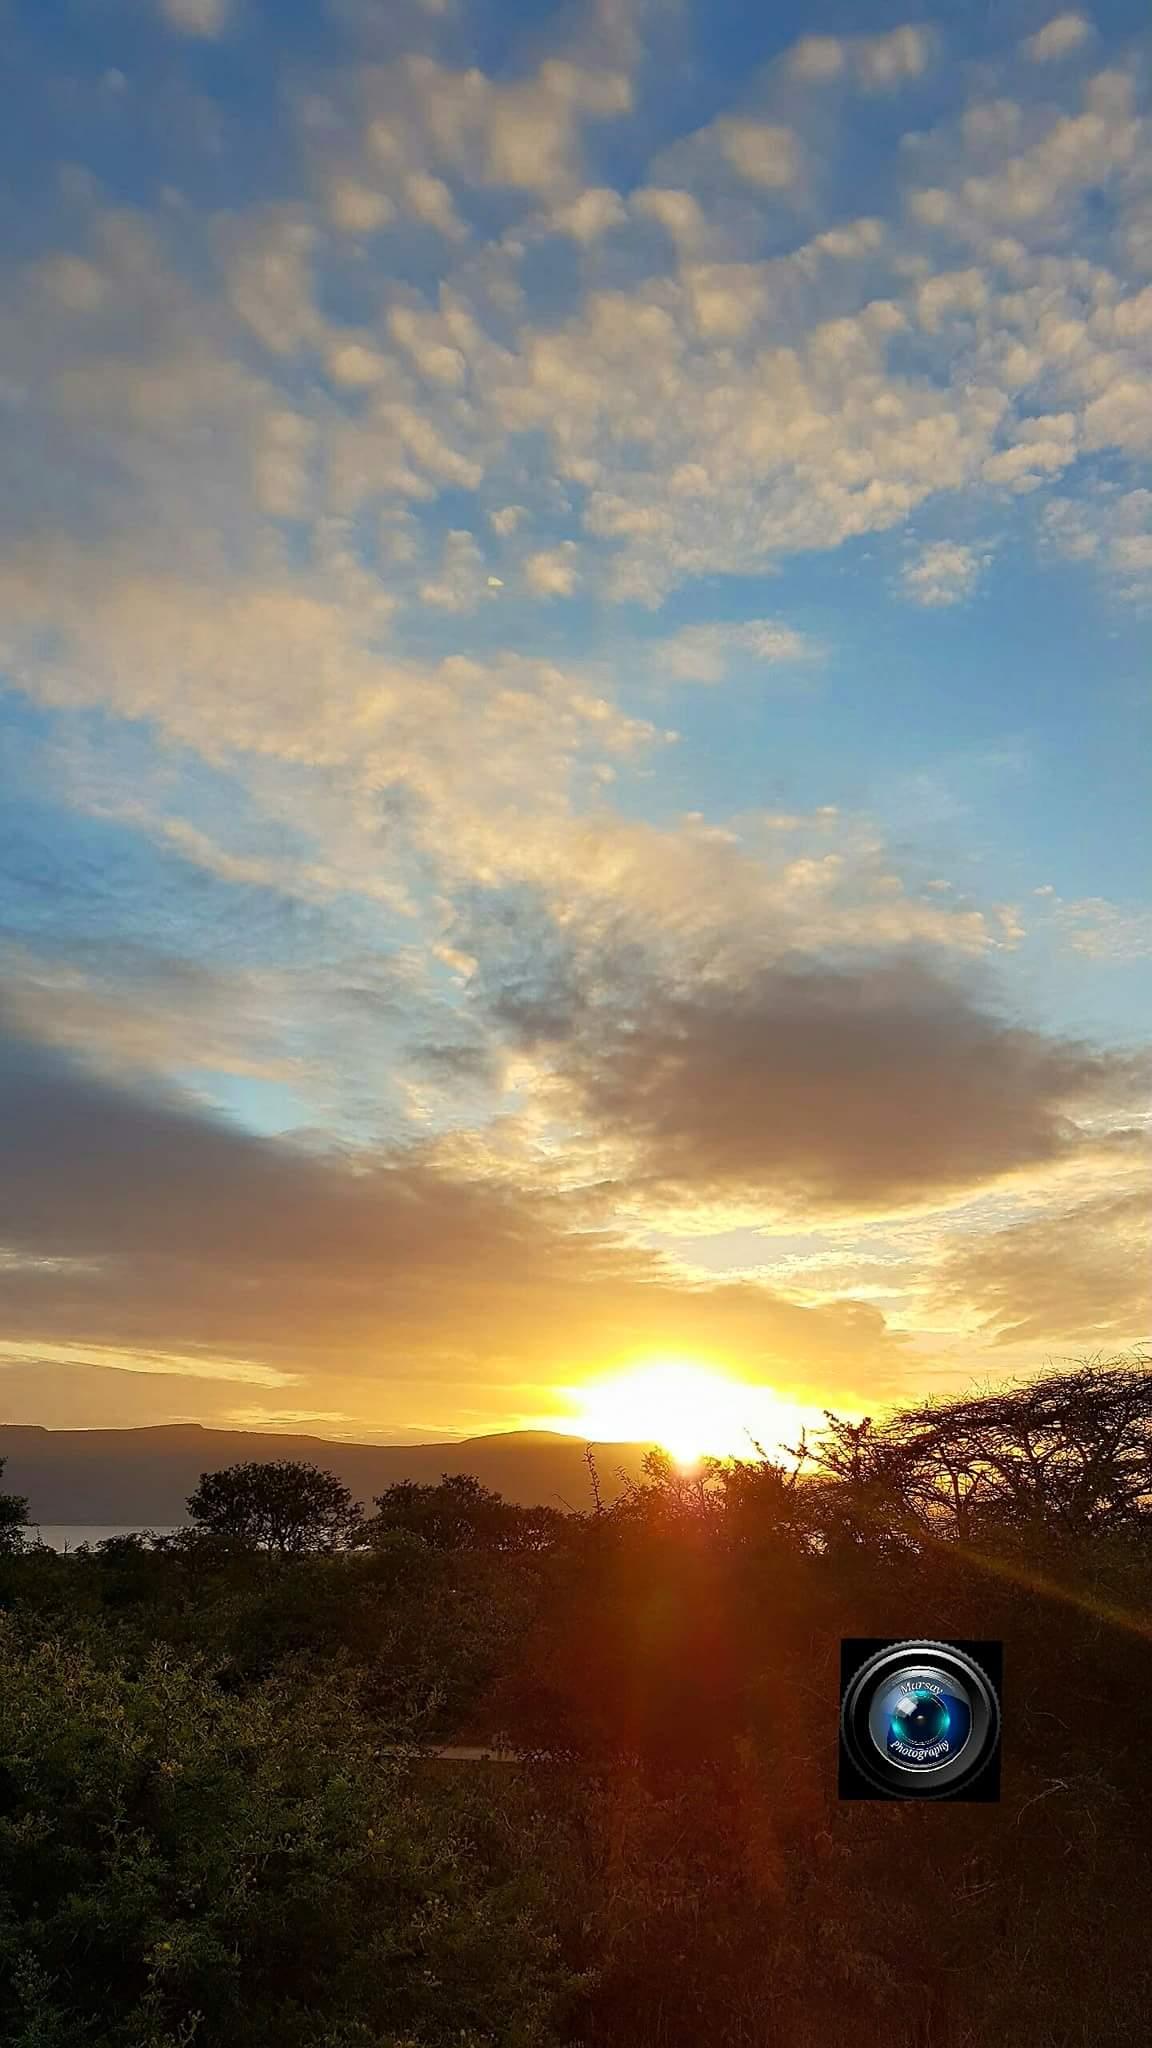 Sunrise in Pongola Nature Reserve, Kwa-Zulu Natal, December 2016.